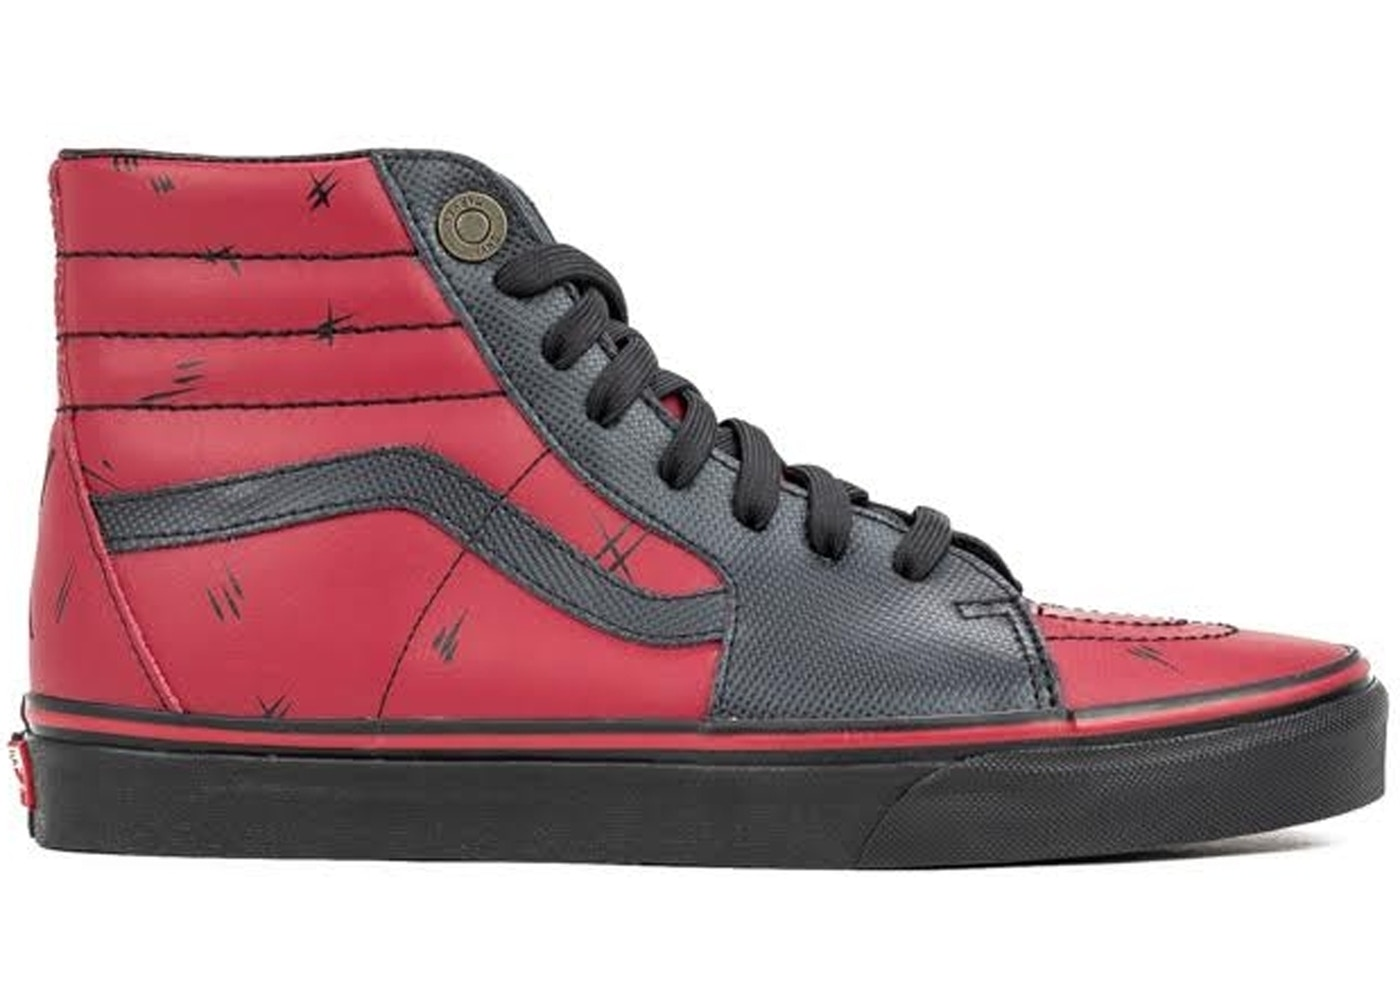 0c7fa8cf2a Kick Avenue - Authentic Sneakers